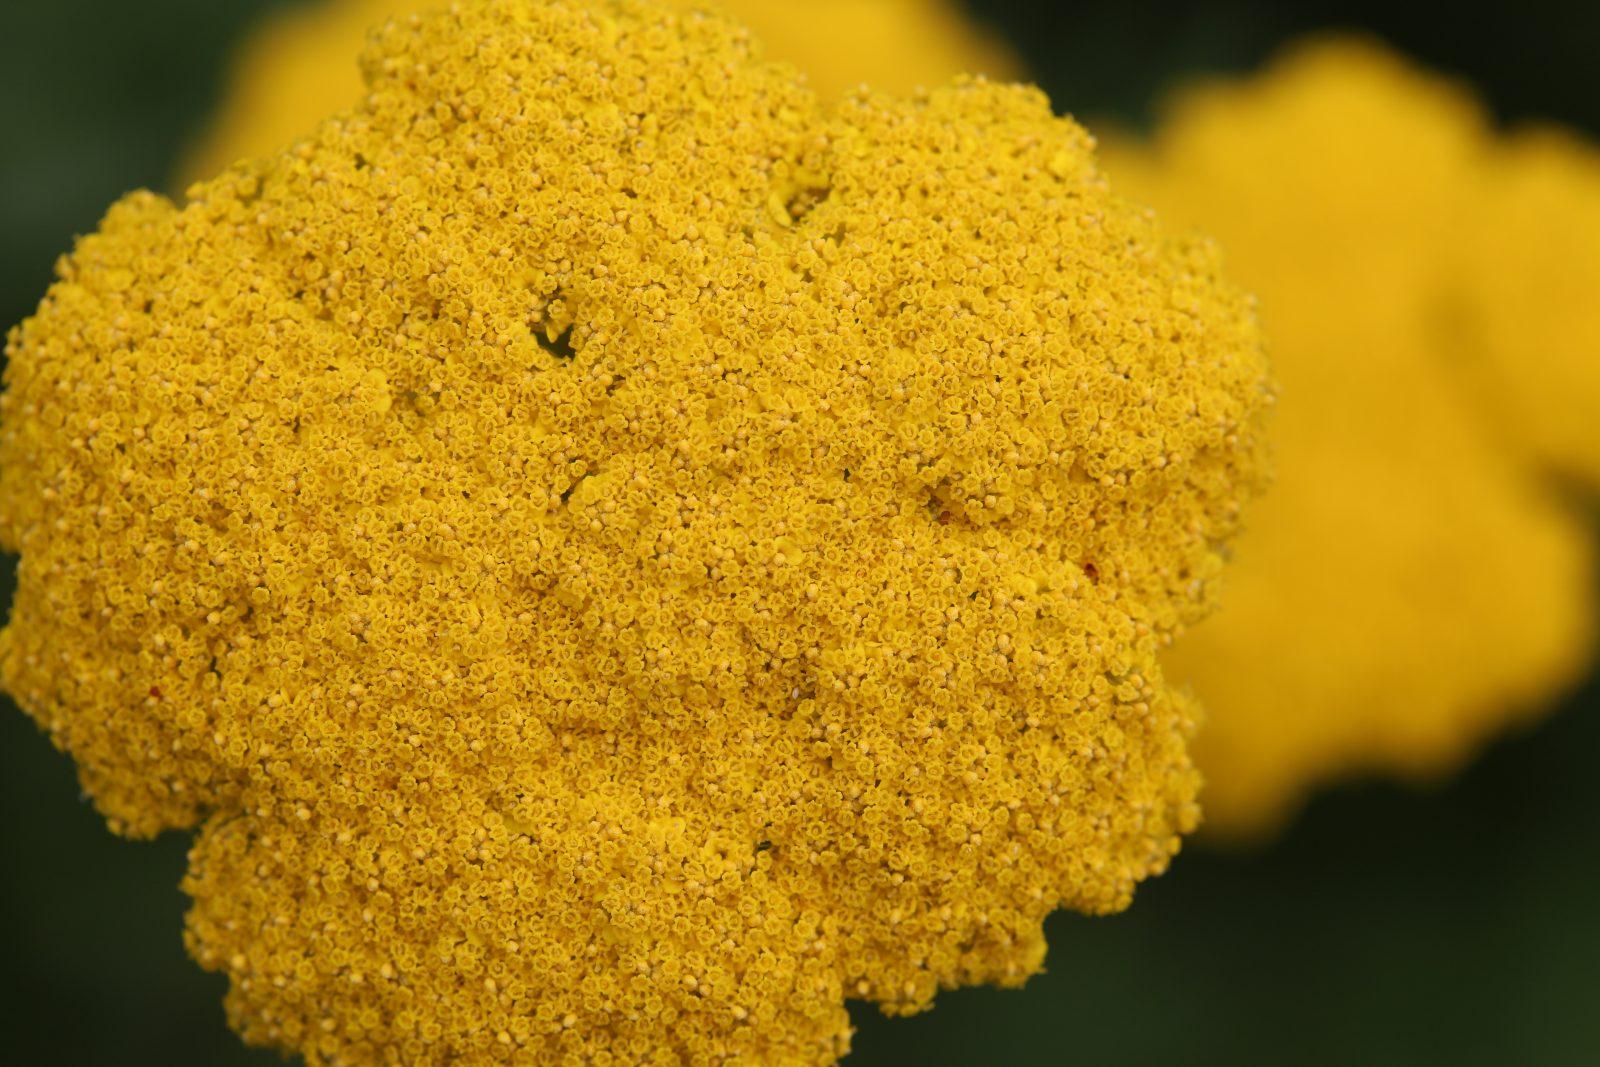 Yellow flowers free stock photos life of pix yellow flowers izmirmasajfo